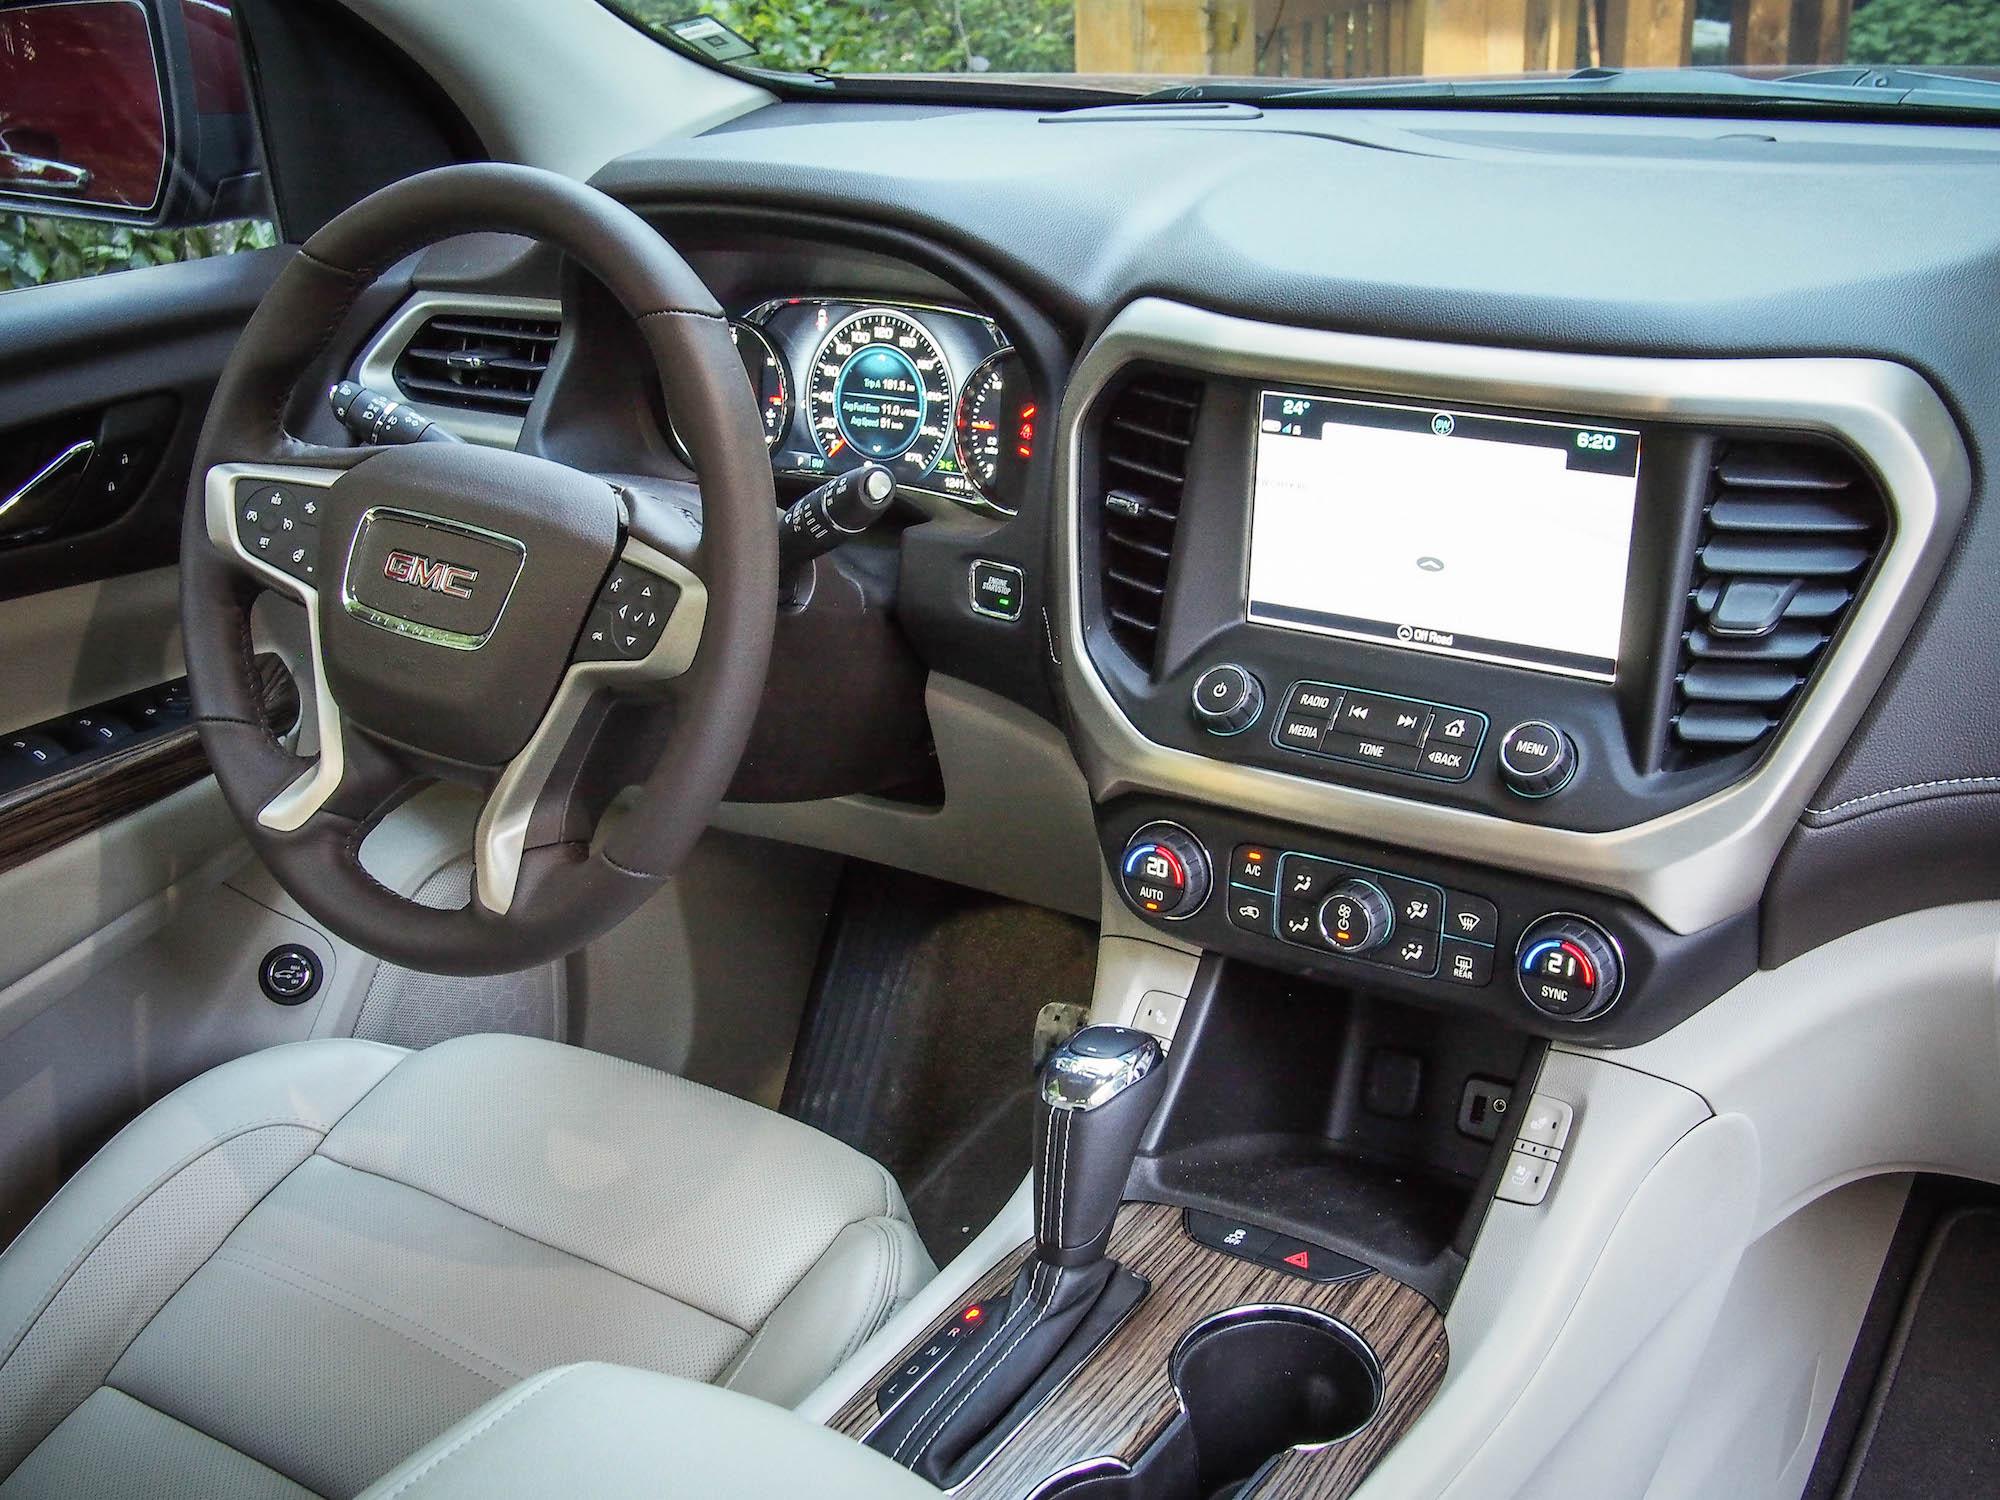 2017 gmc acadia canadian auto review for Gmc acadia denali 2017 interior